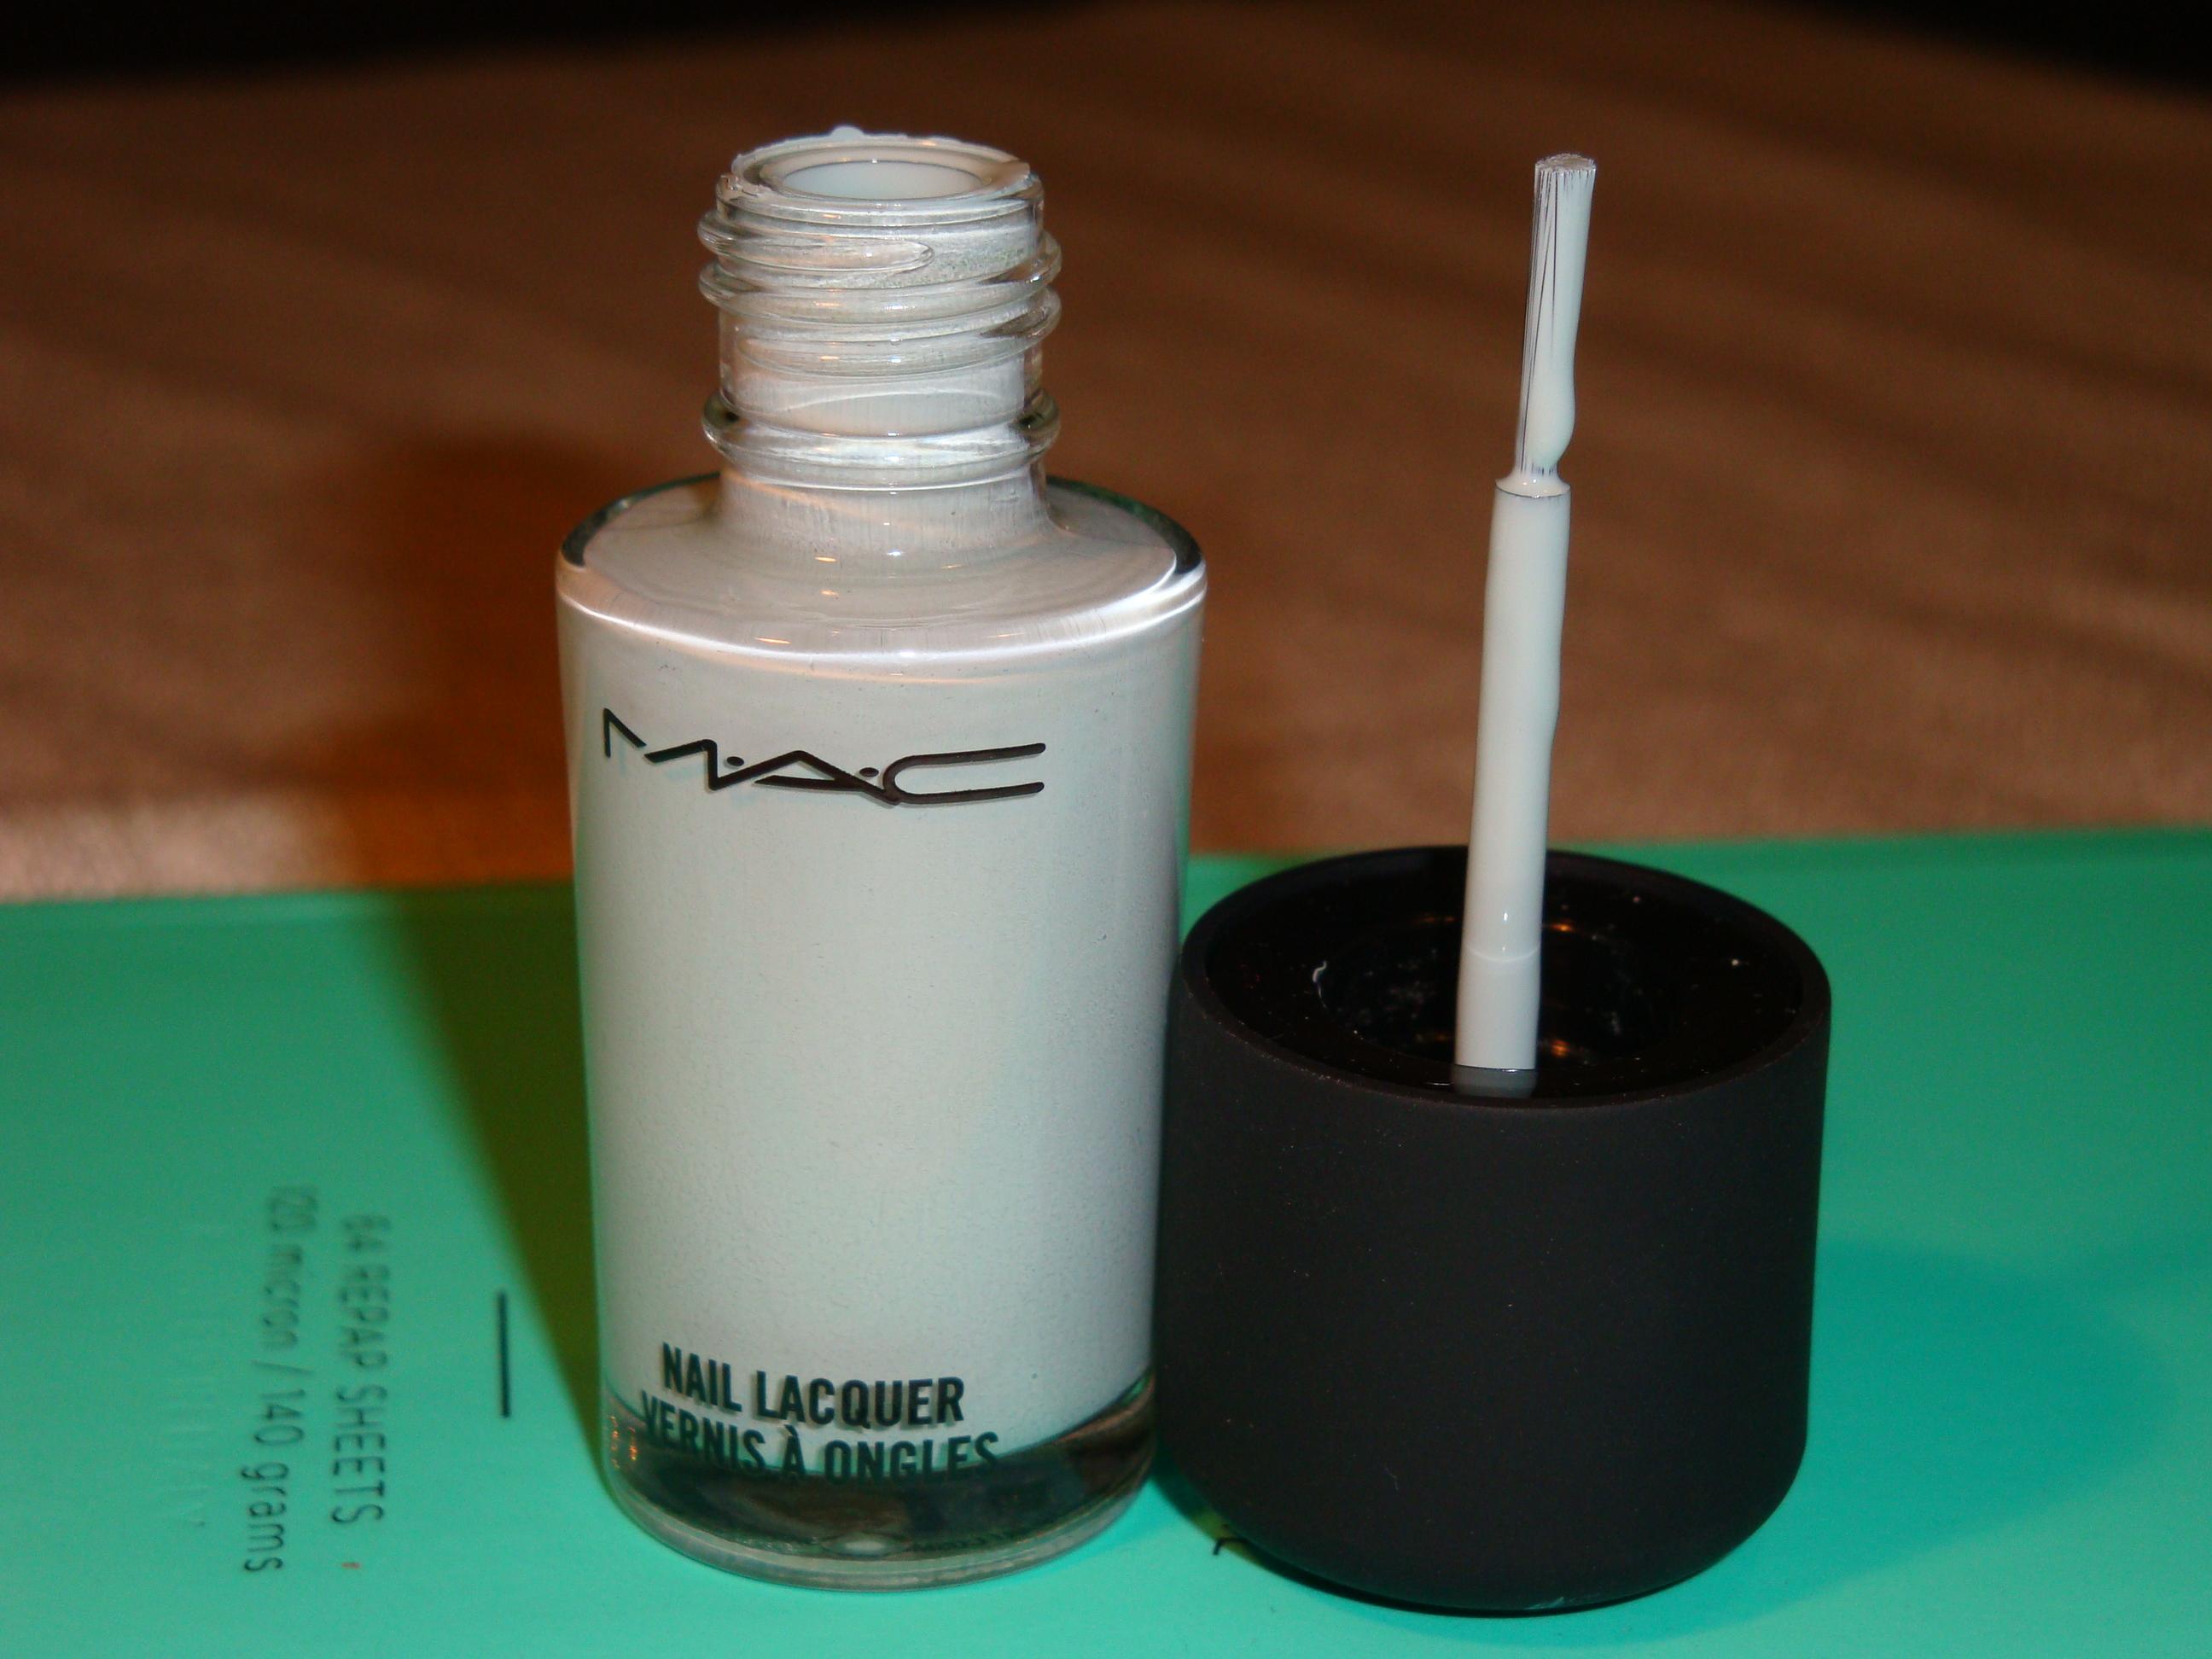 MAC nail polish Hyperion